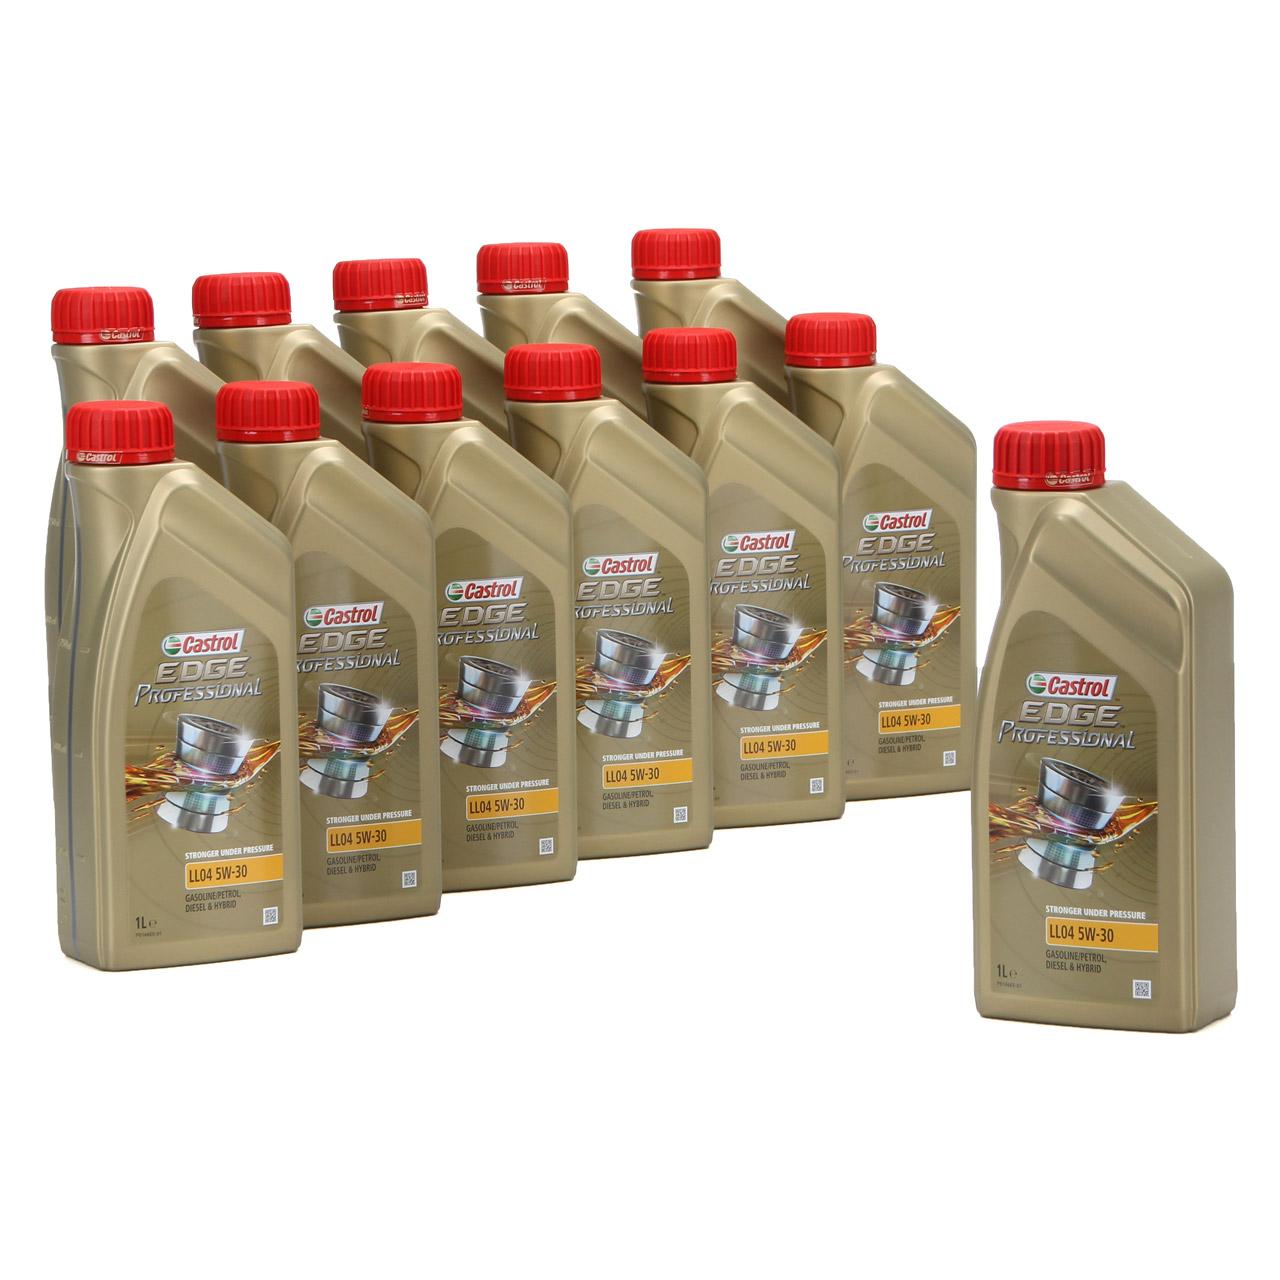 CASTROL EDGE Professional Motoröl Öl für BMW Longlife IV LL04 5W-30 - 12 Liter